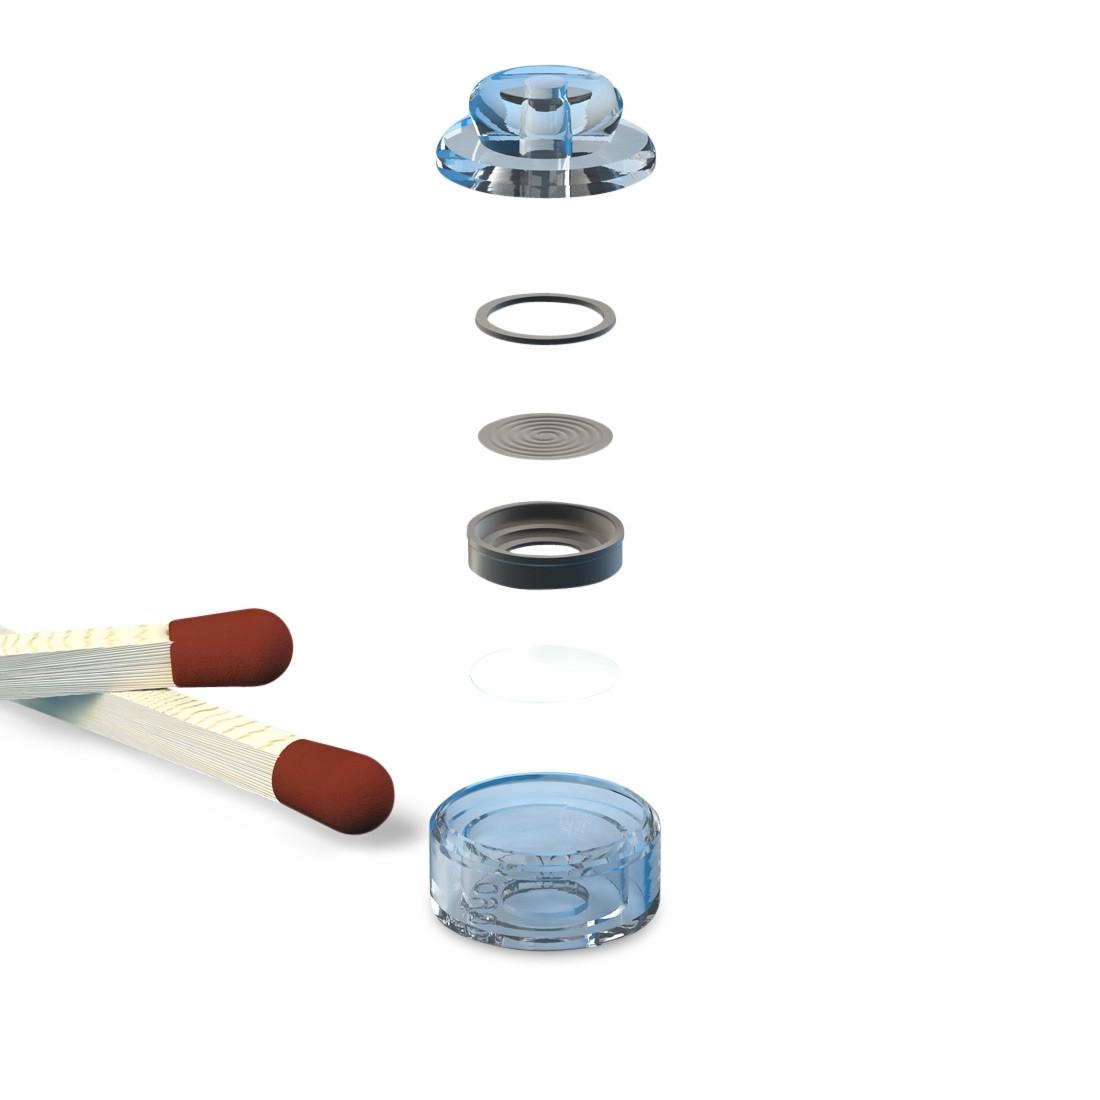 Gehörschutzfilter fidelity b25 - Aufbau